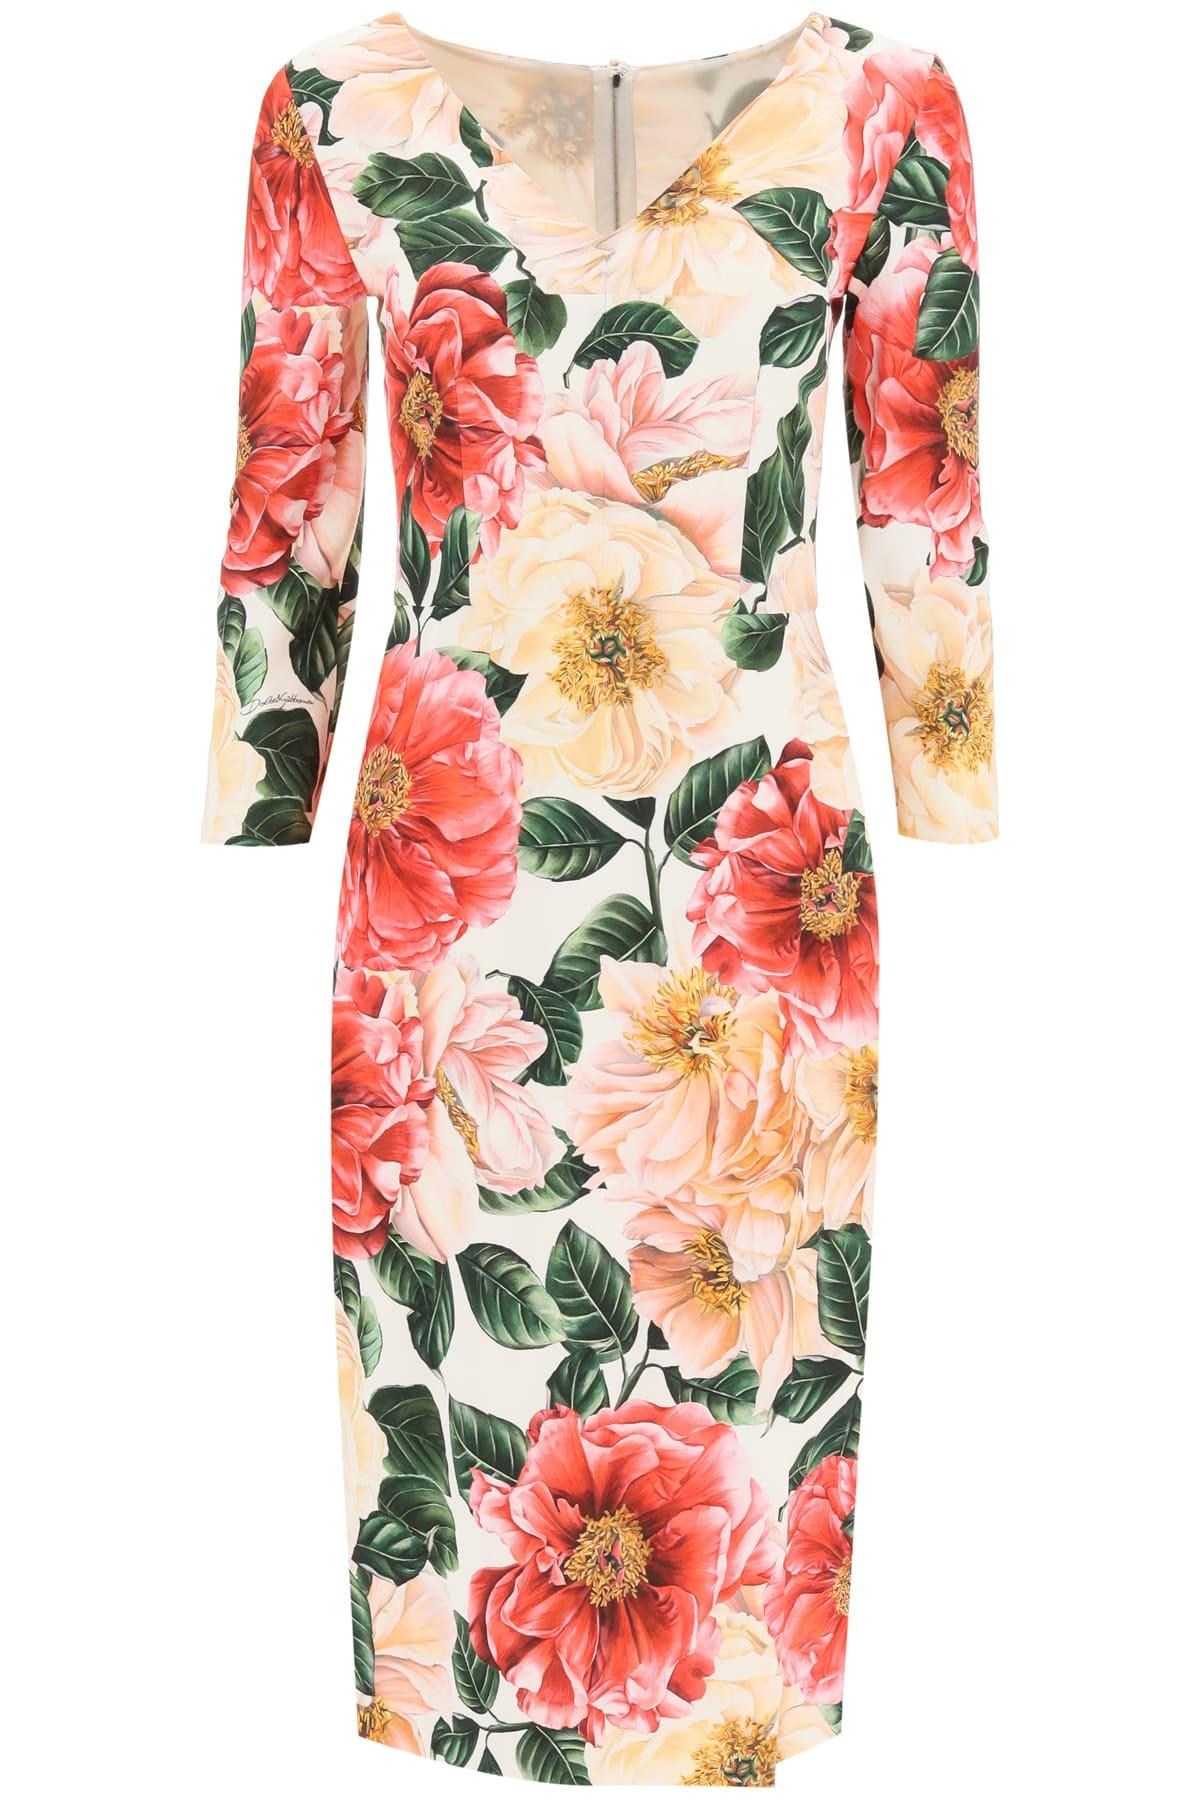 Dolce & Gabbana Camellia Print Cady Dress